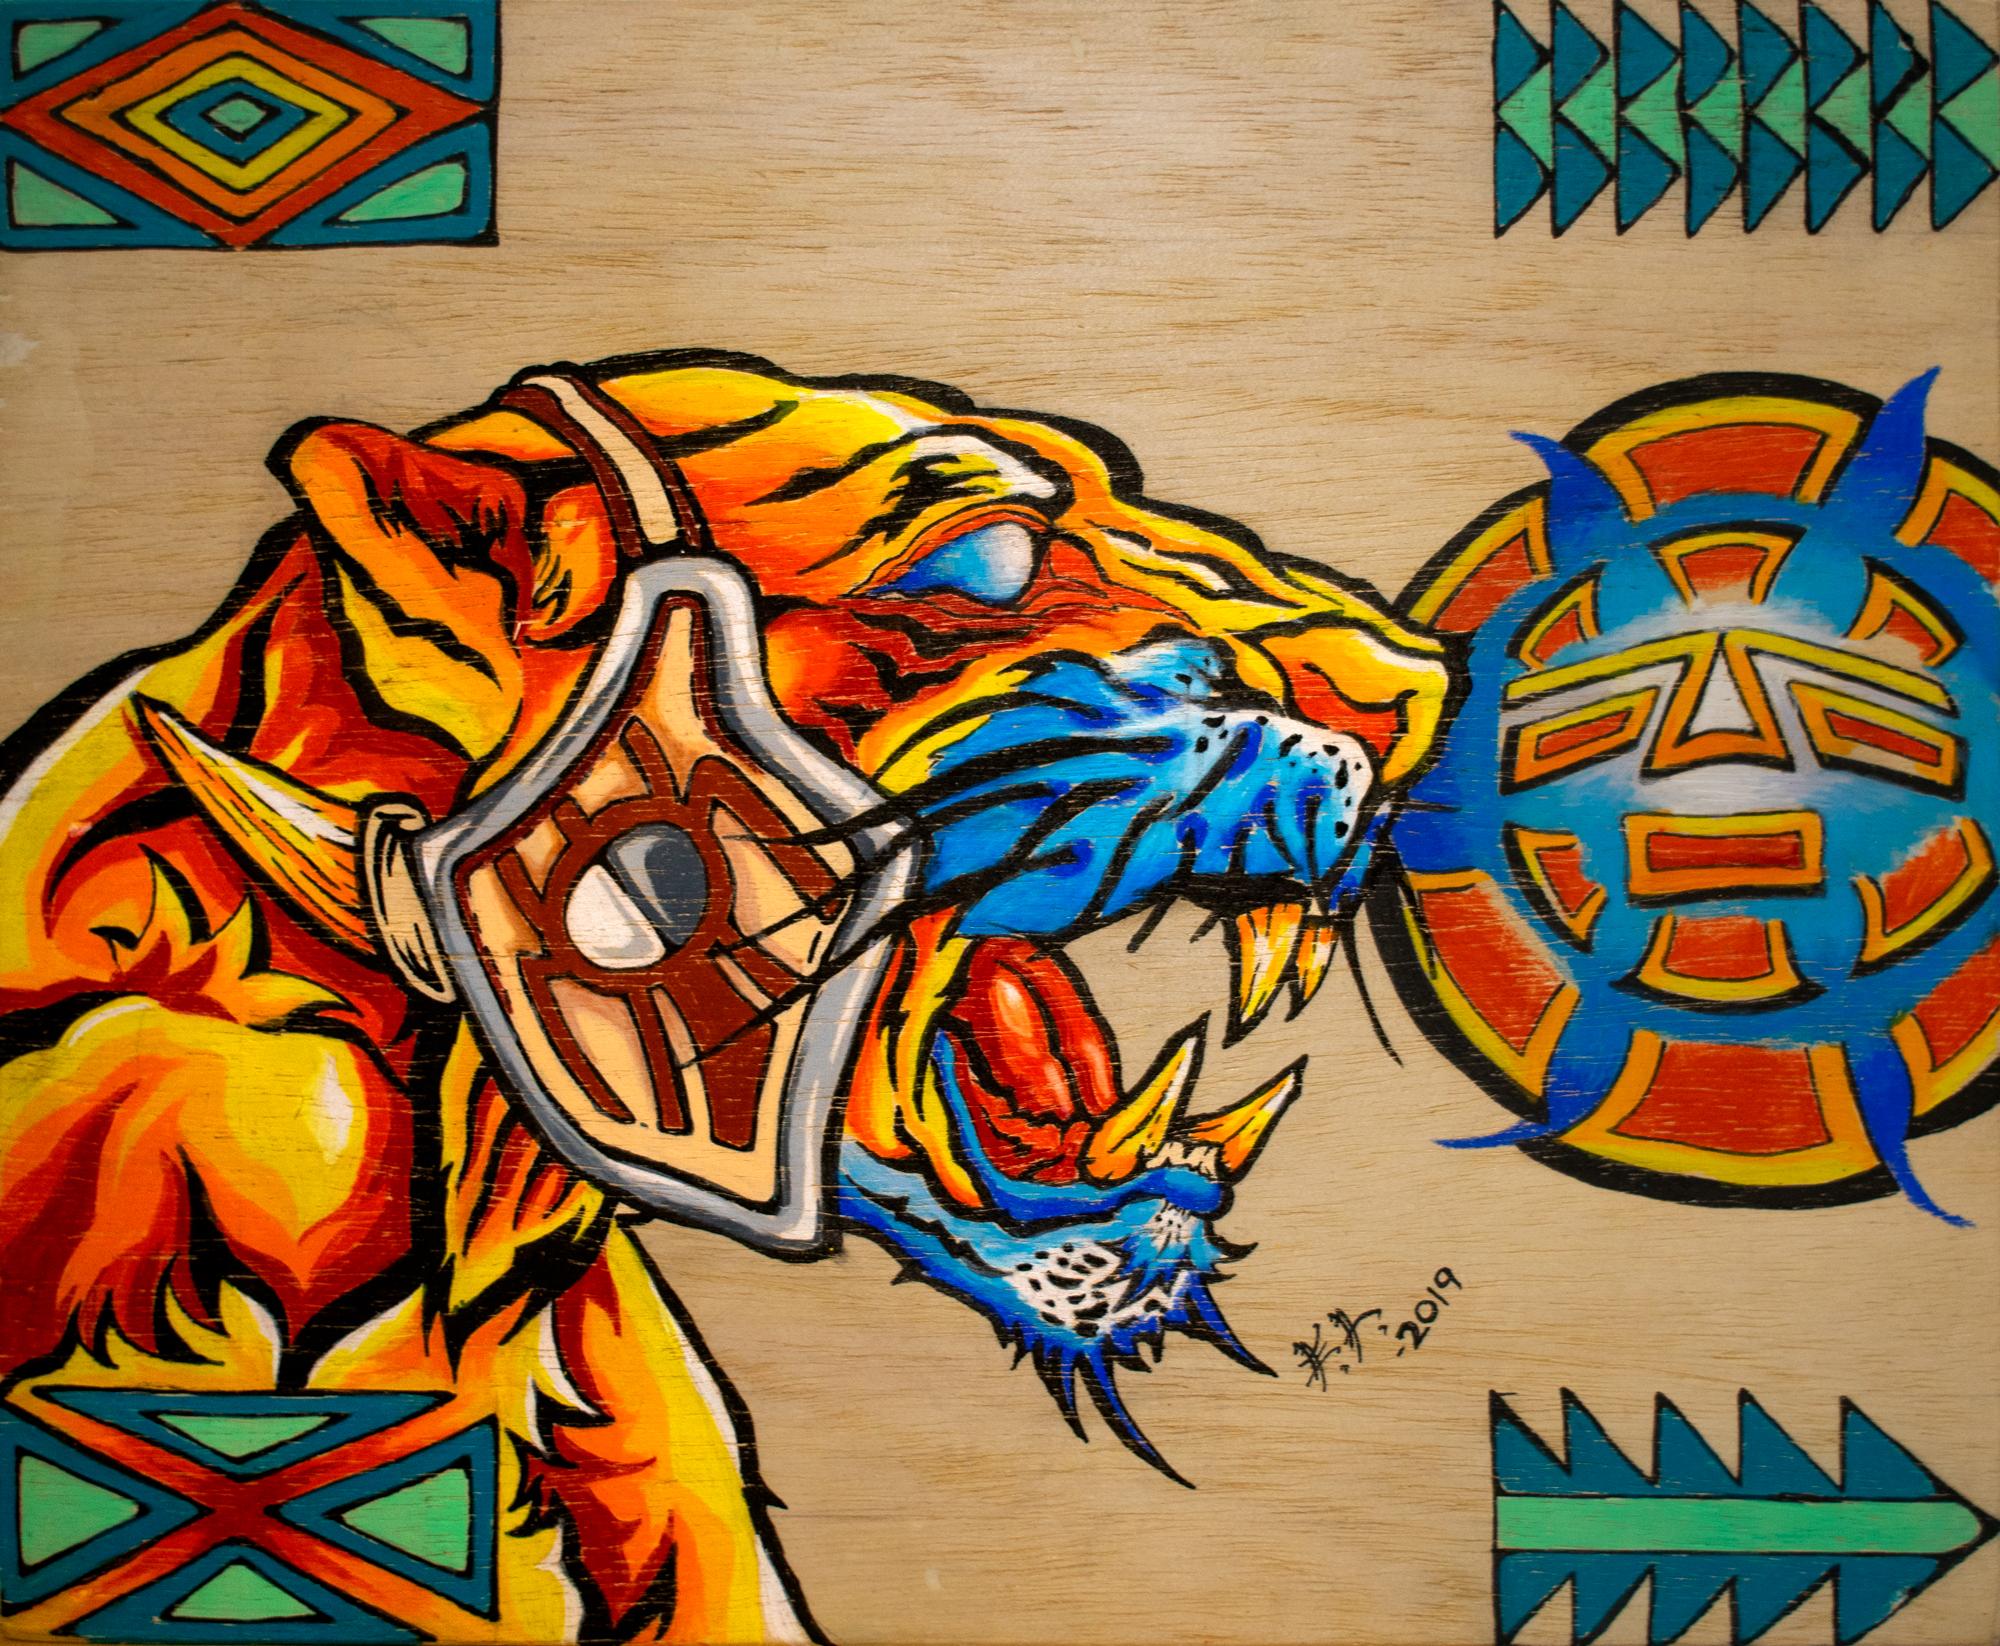 Jaguar De Pachacuti